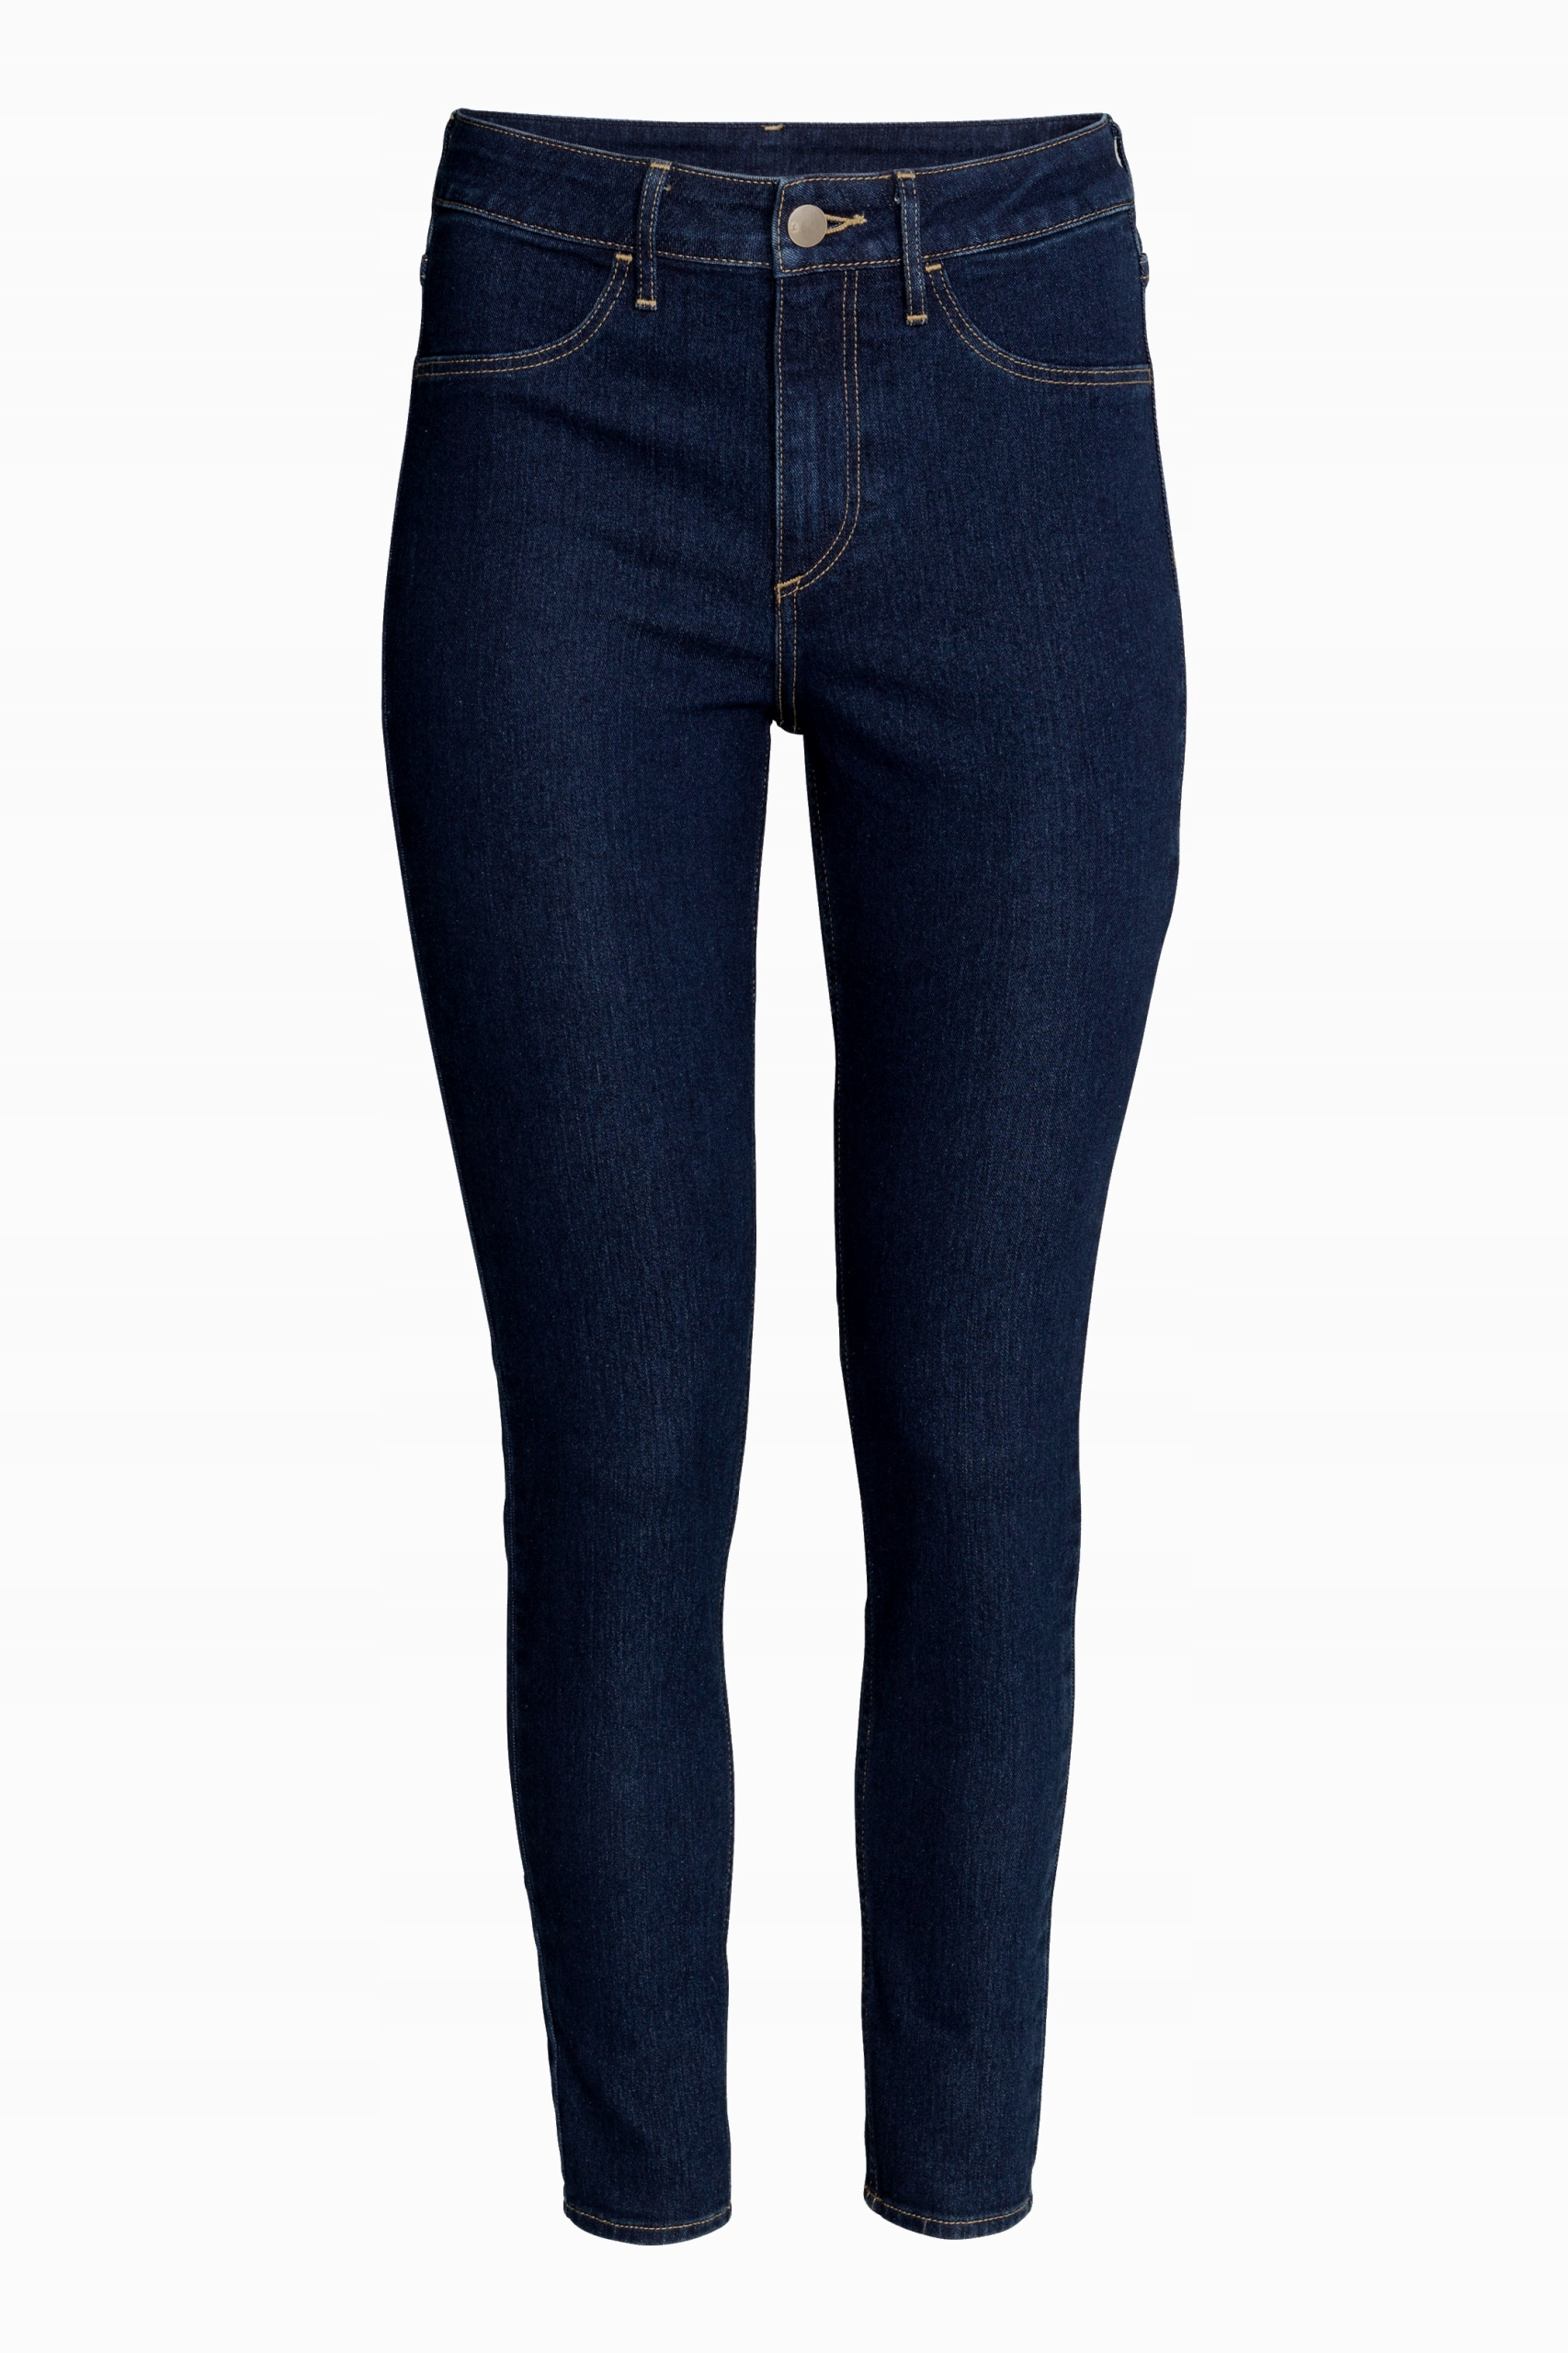 H&m Slim Fit High Spodnie Ankle rurki W26 36 S